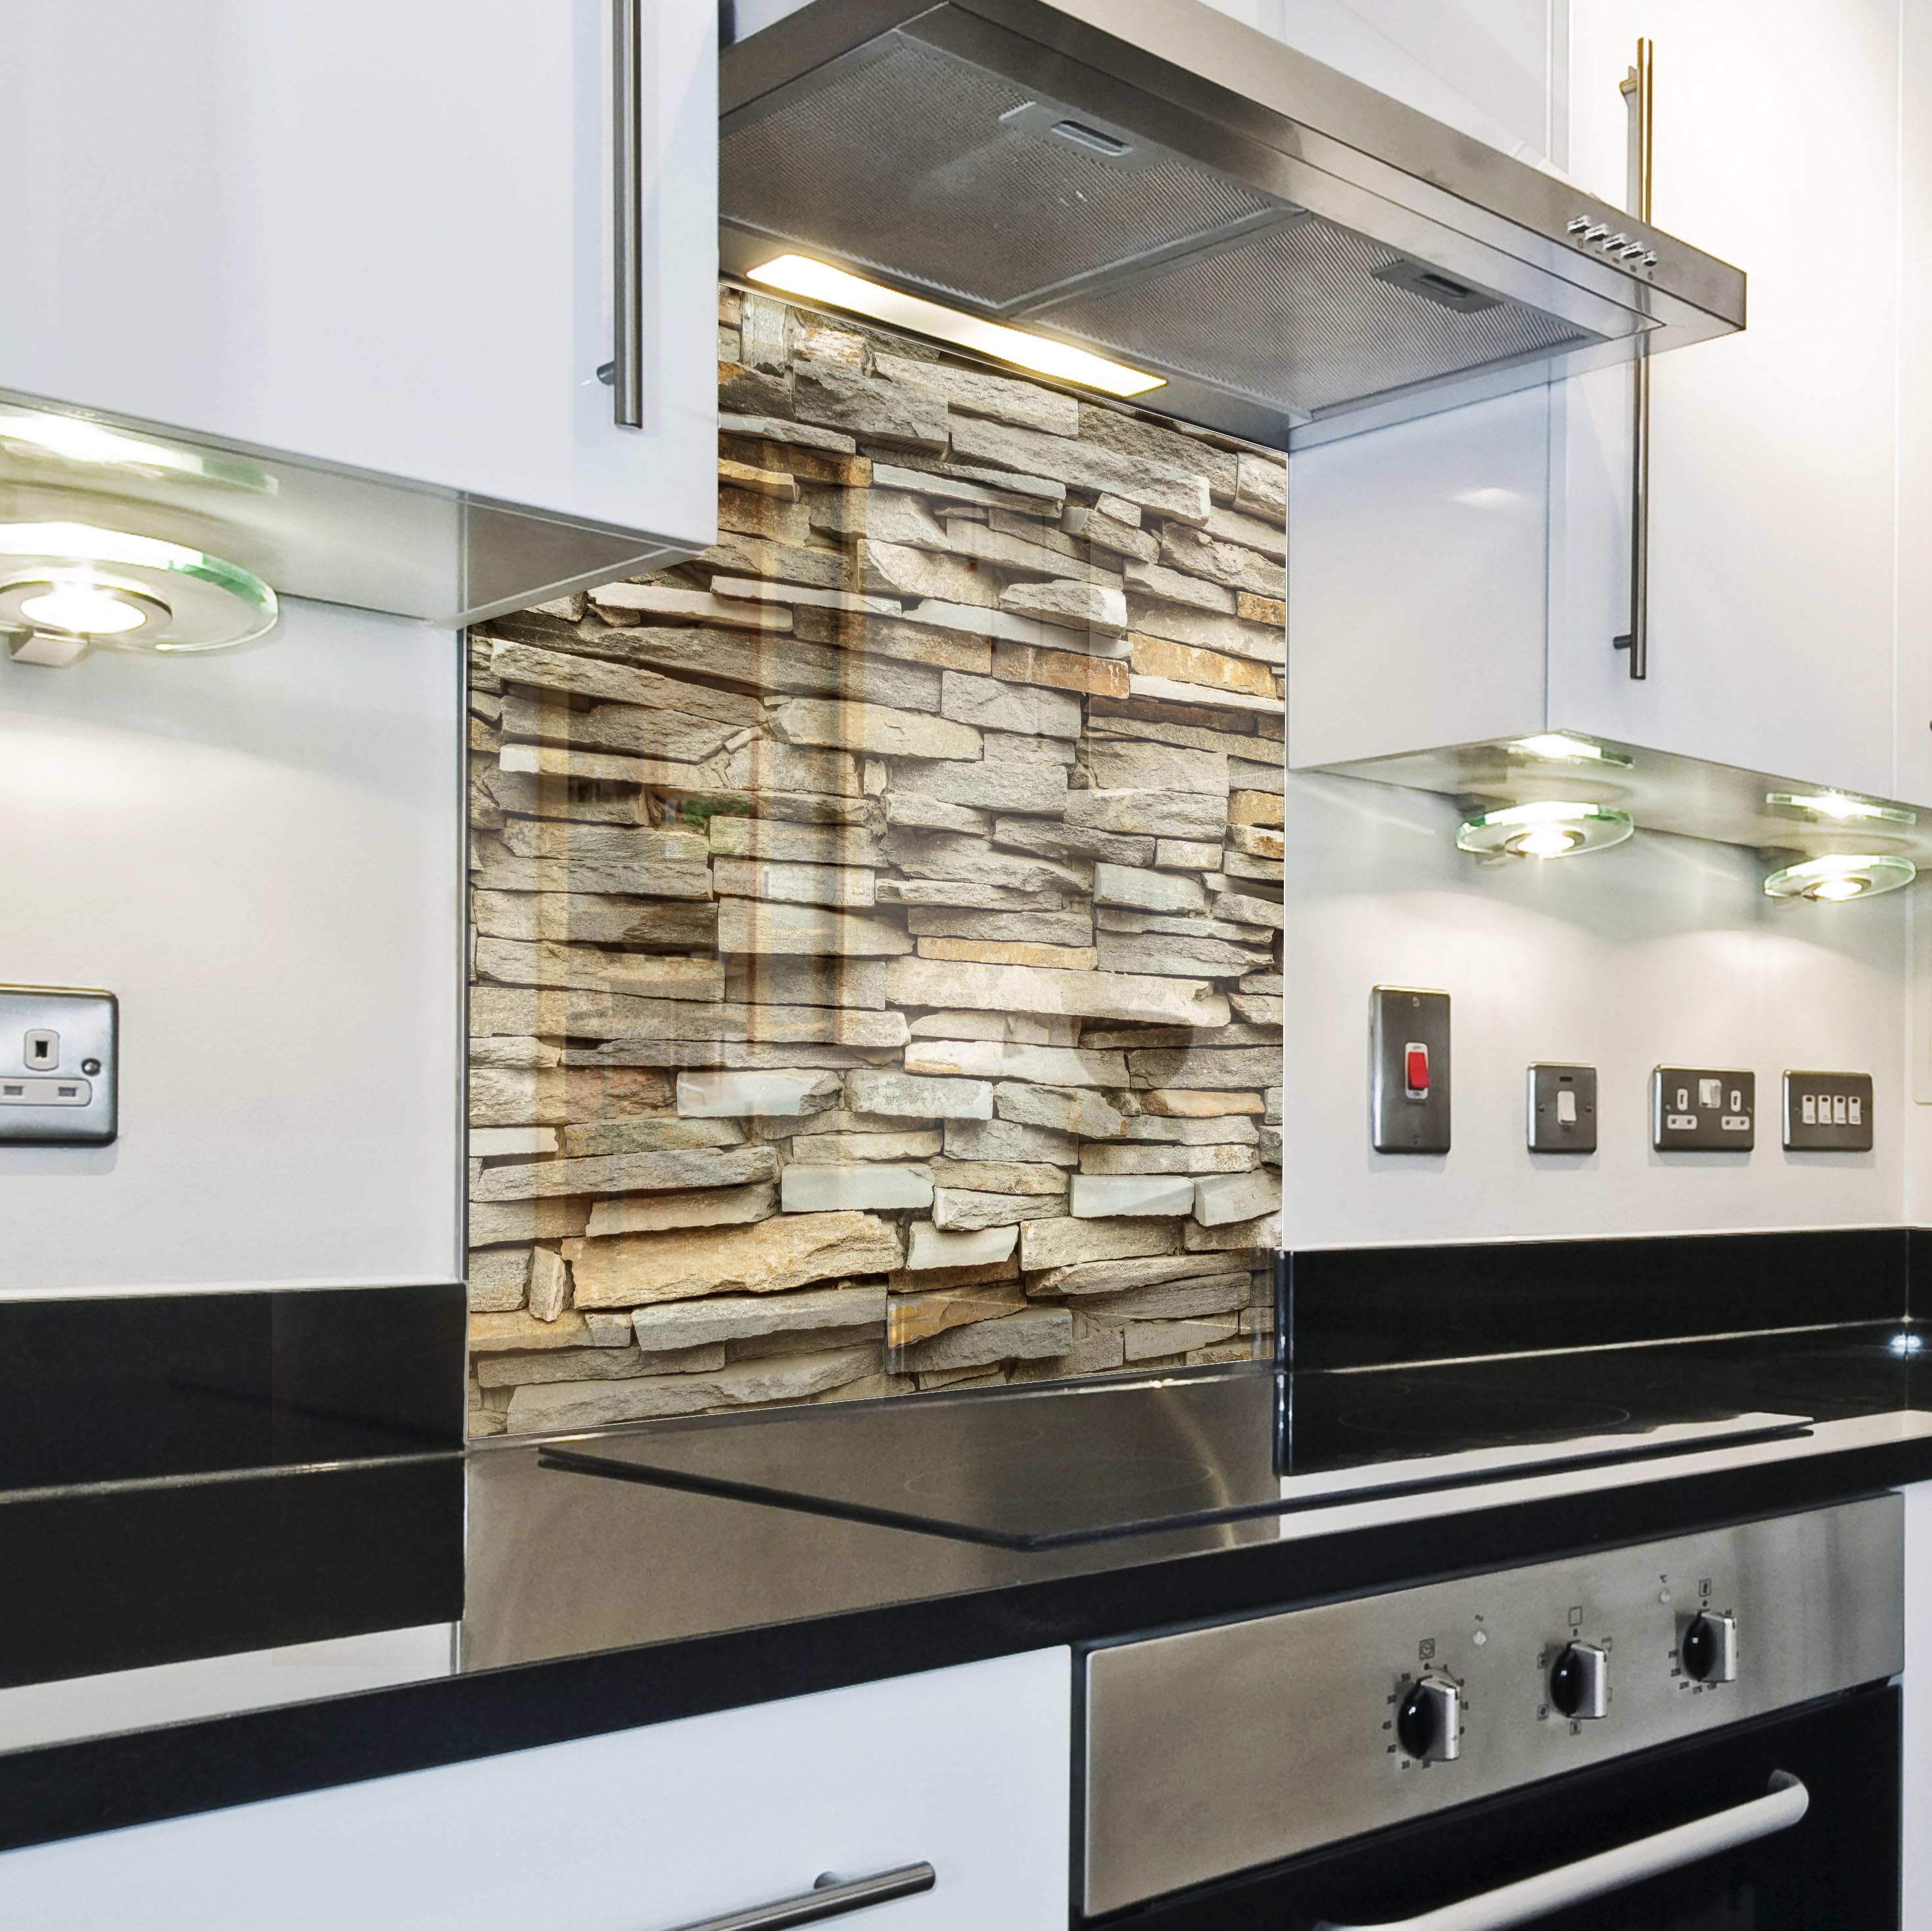 Splashback paraschizzi paraspruzzi rivestimento cucina - Pannello cucina rivestimento ...